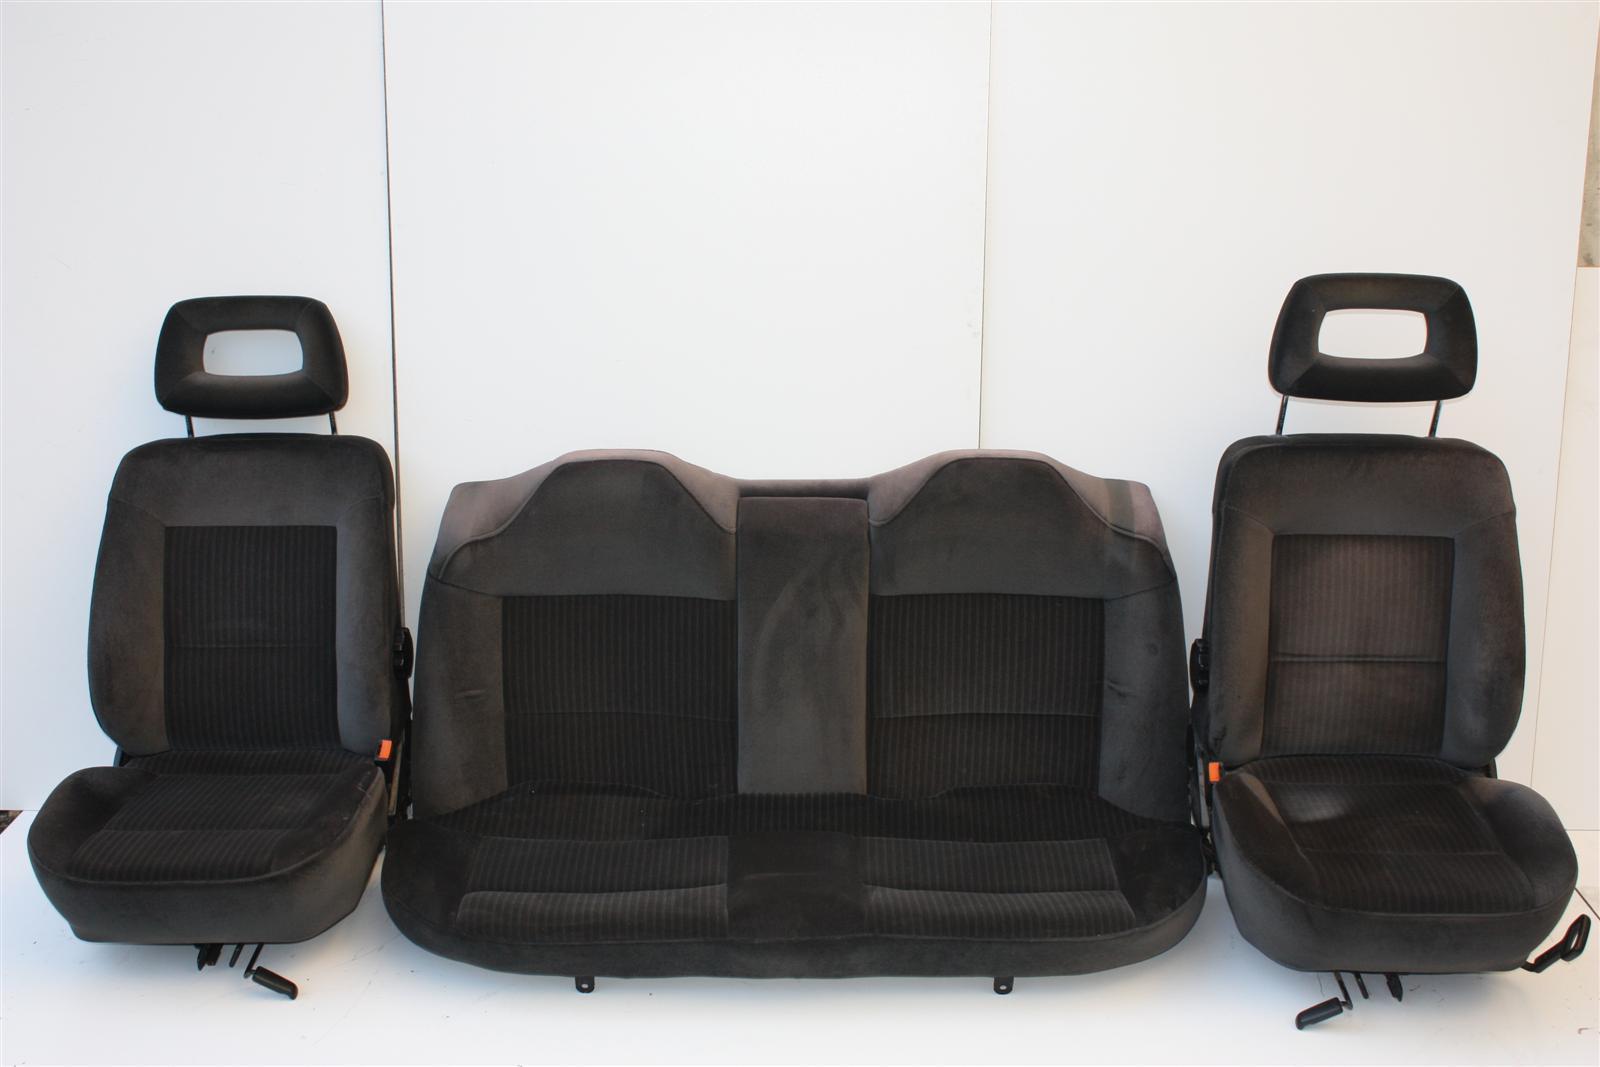 audi 80 90 typ 89 limousine innenausstattung velours grau. Black Bedroom Furniture Sets. Home Design Ideas